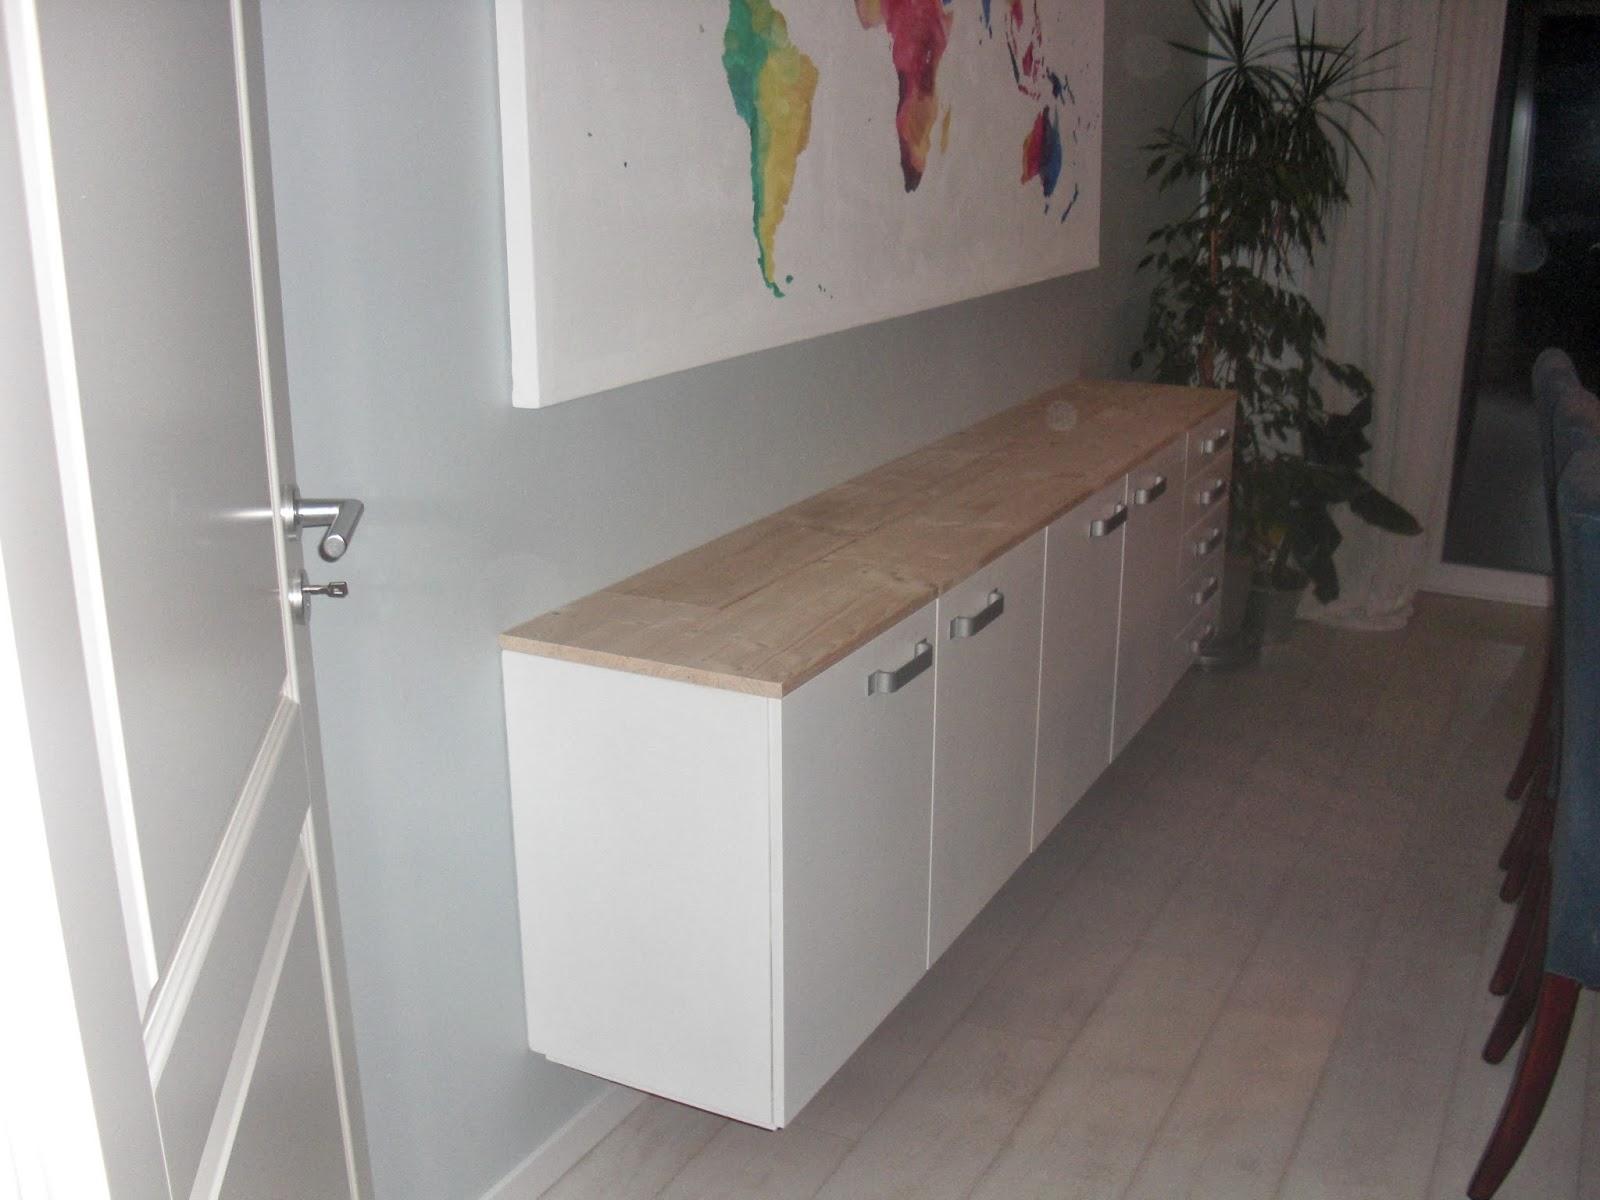 k che sideboard mit arbeitsplatte hausgestaltung. Black Bedroom Furniture Sets. Home Design Ideas